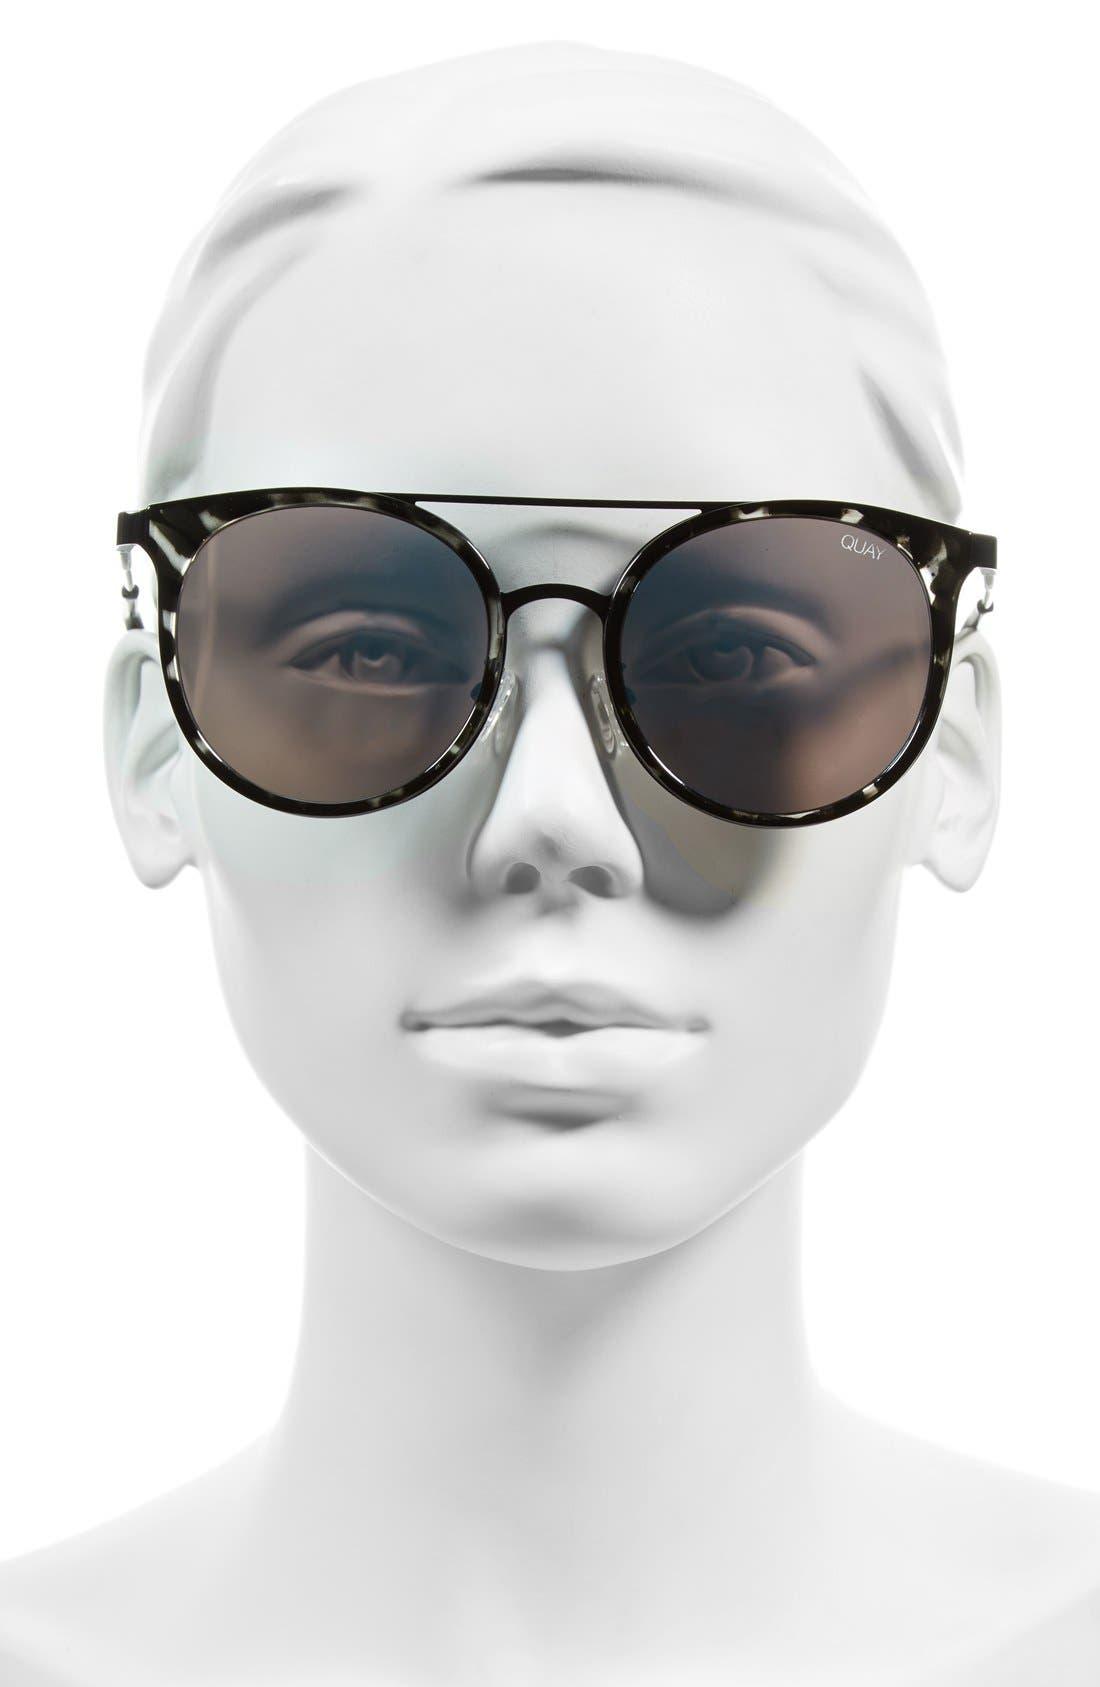 Kandy Gram 51mm Round Sunglasses,                             Alternate thumbnail 4, color,